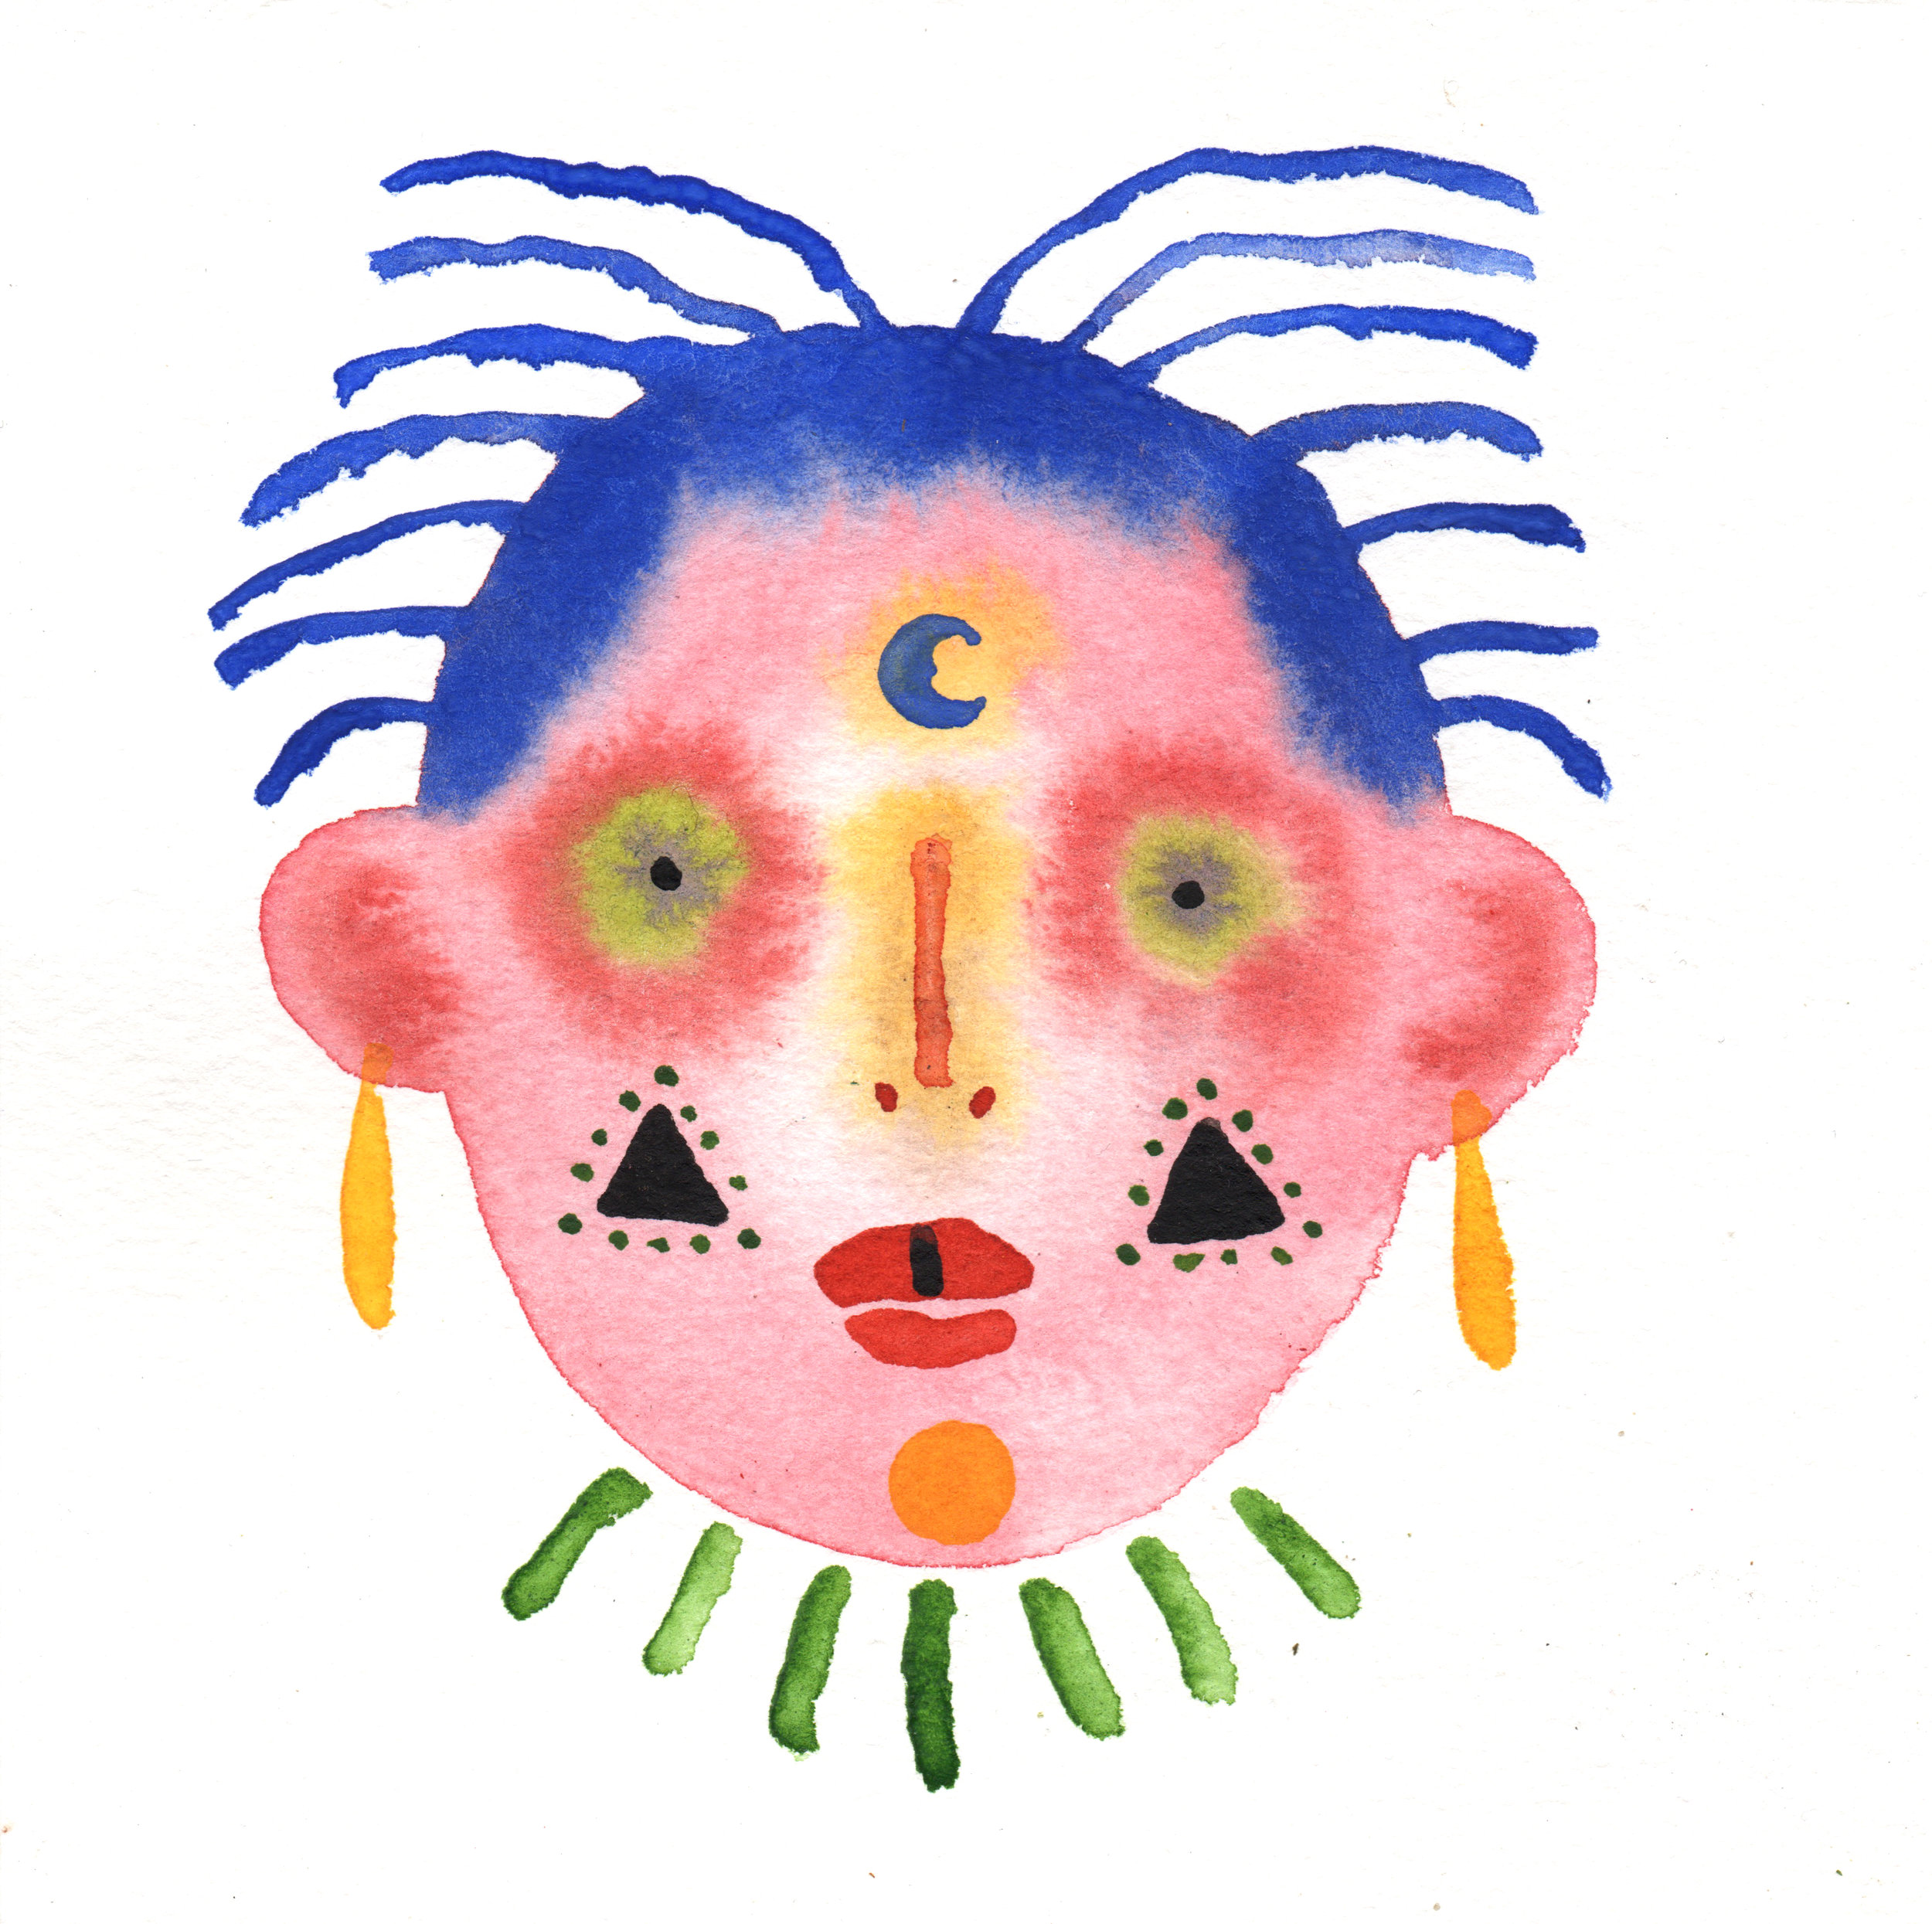 shamanfacepink_edit.jpg